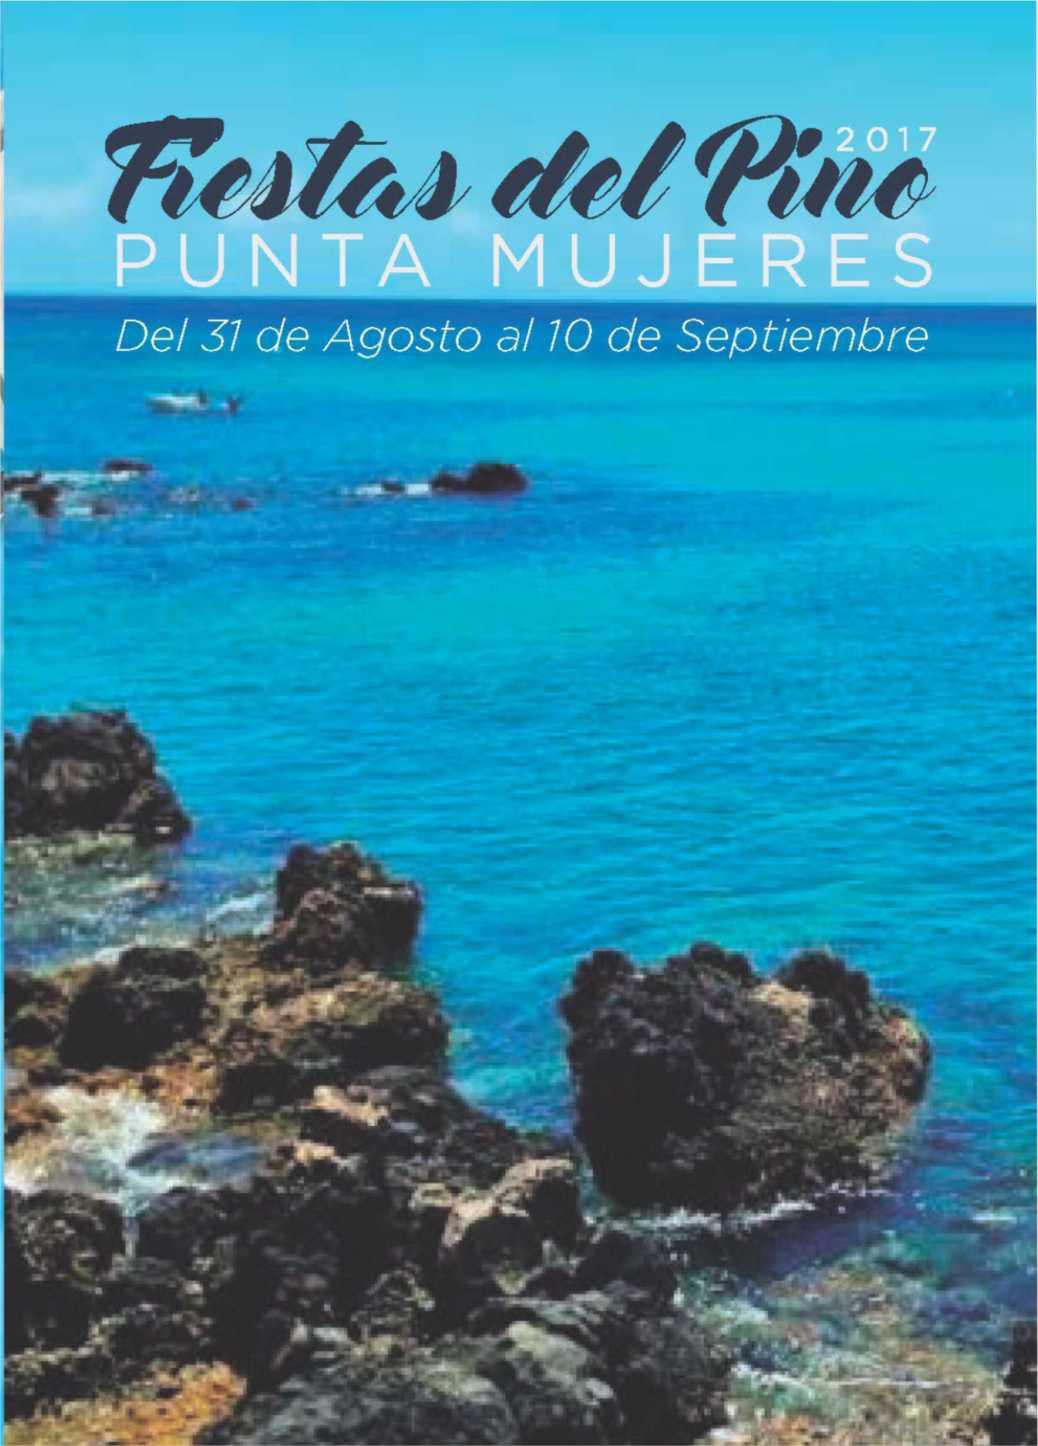 Punta Mujeres 2017